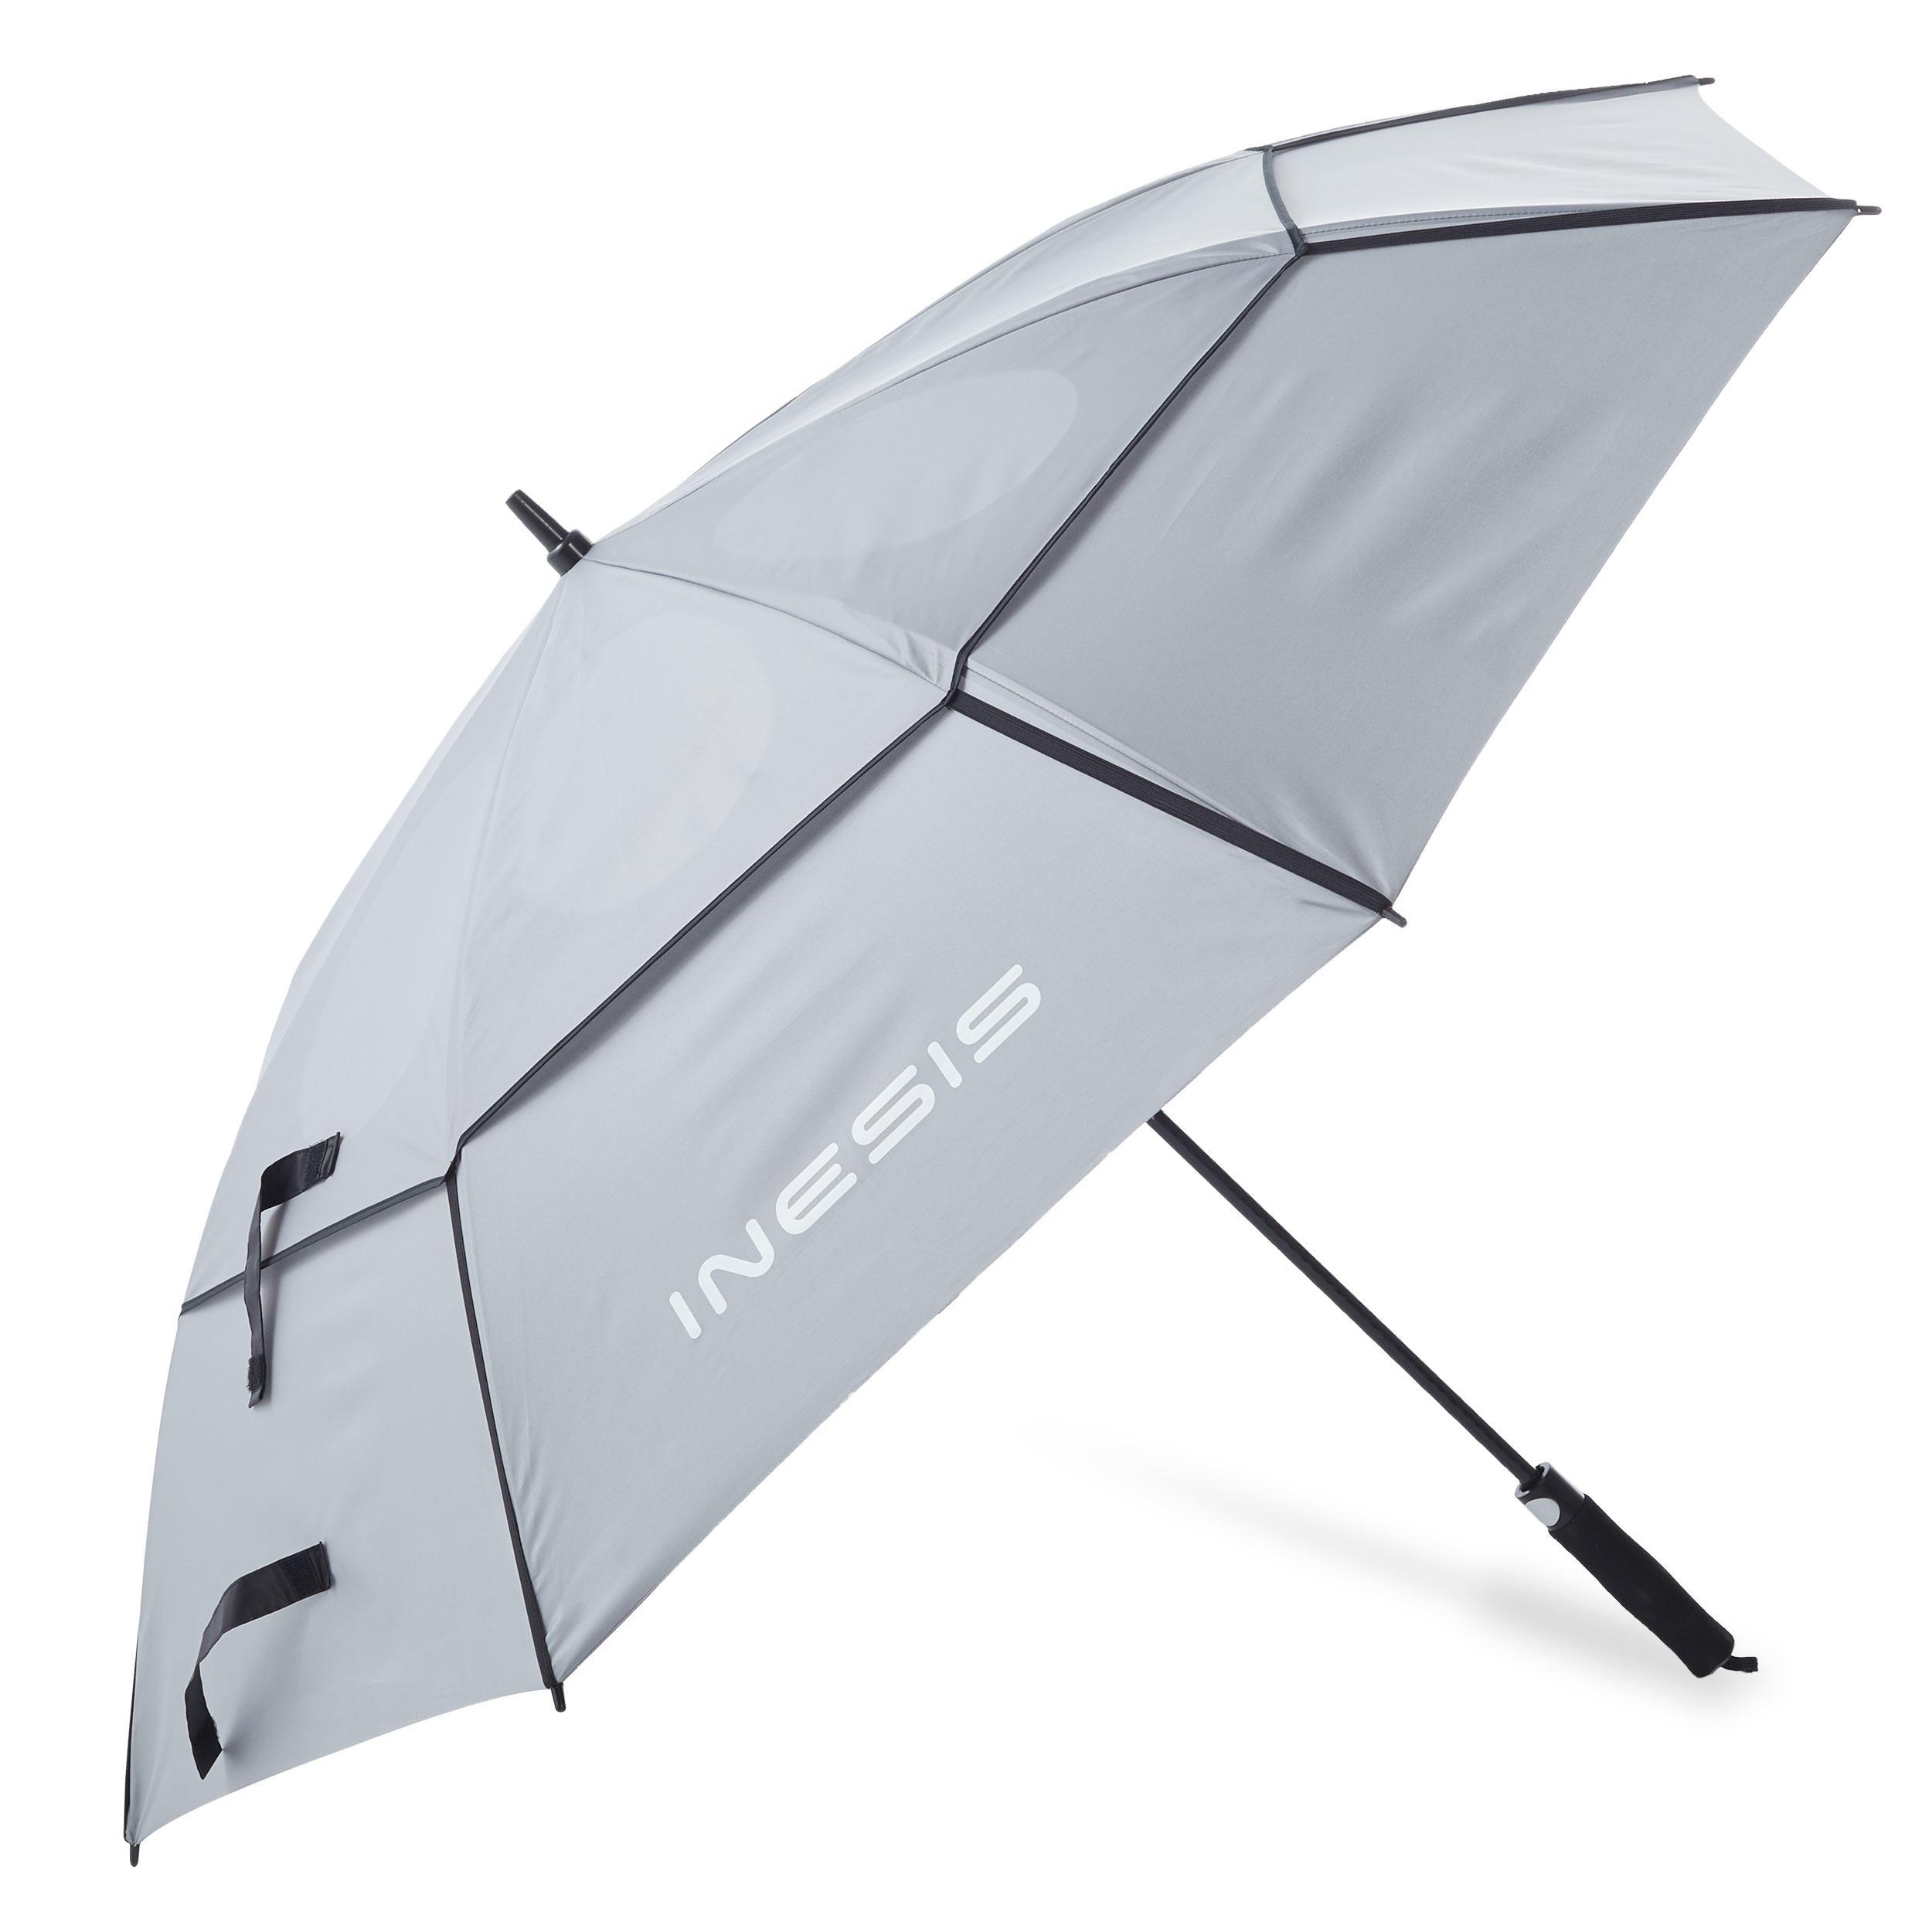 Inesis Parapluie Golf ProFilter Large SQG - Inesis